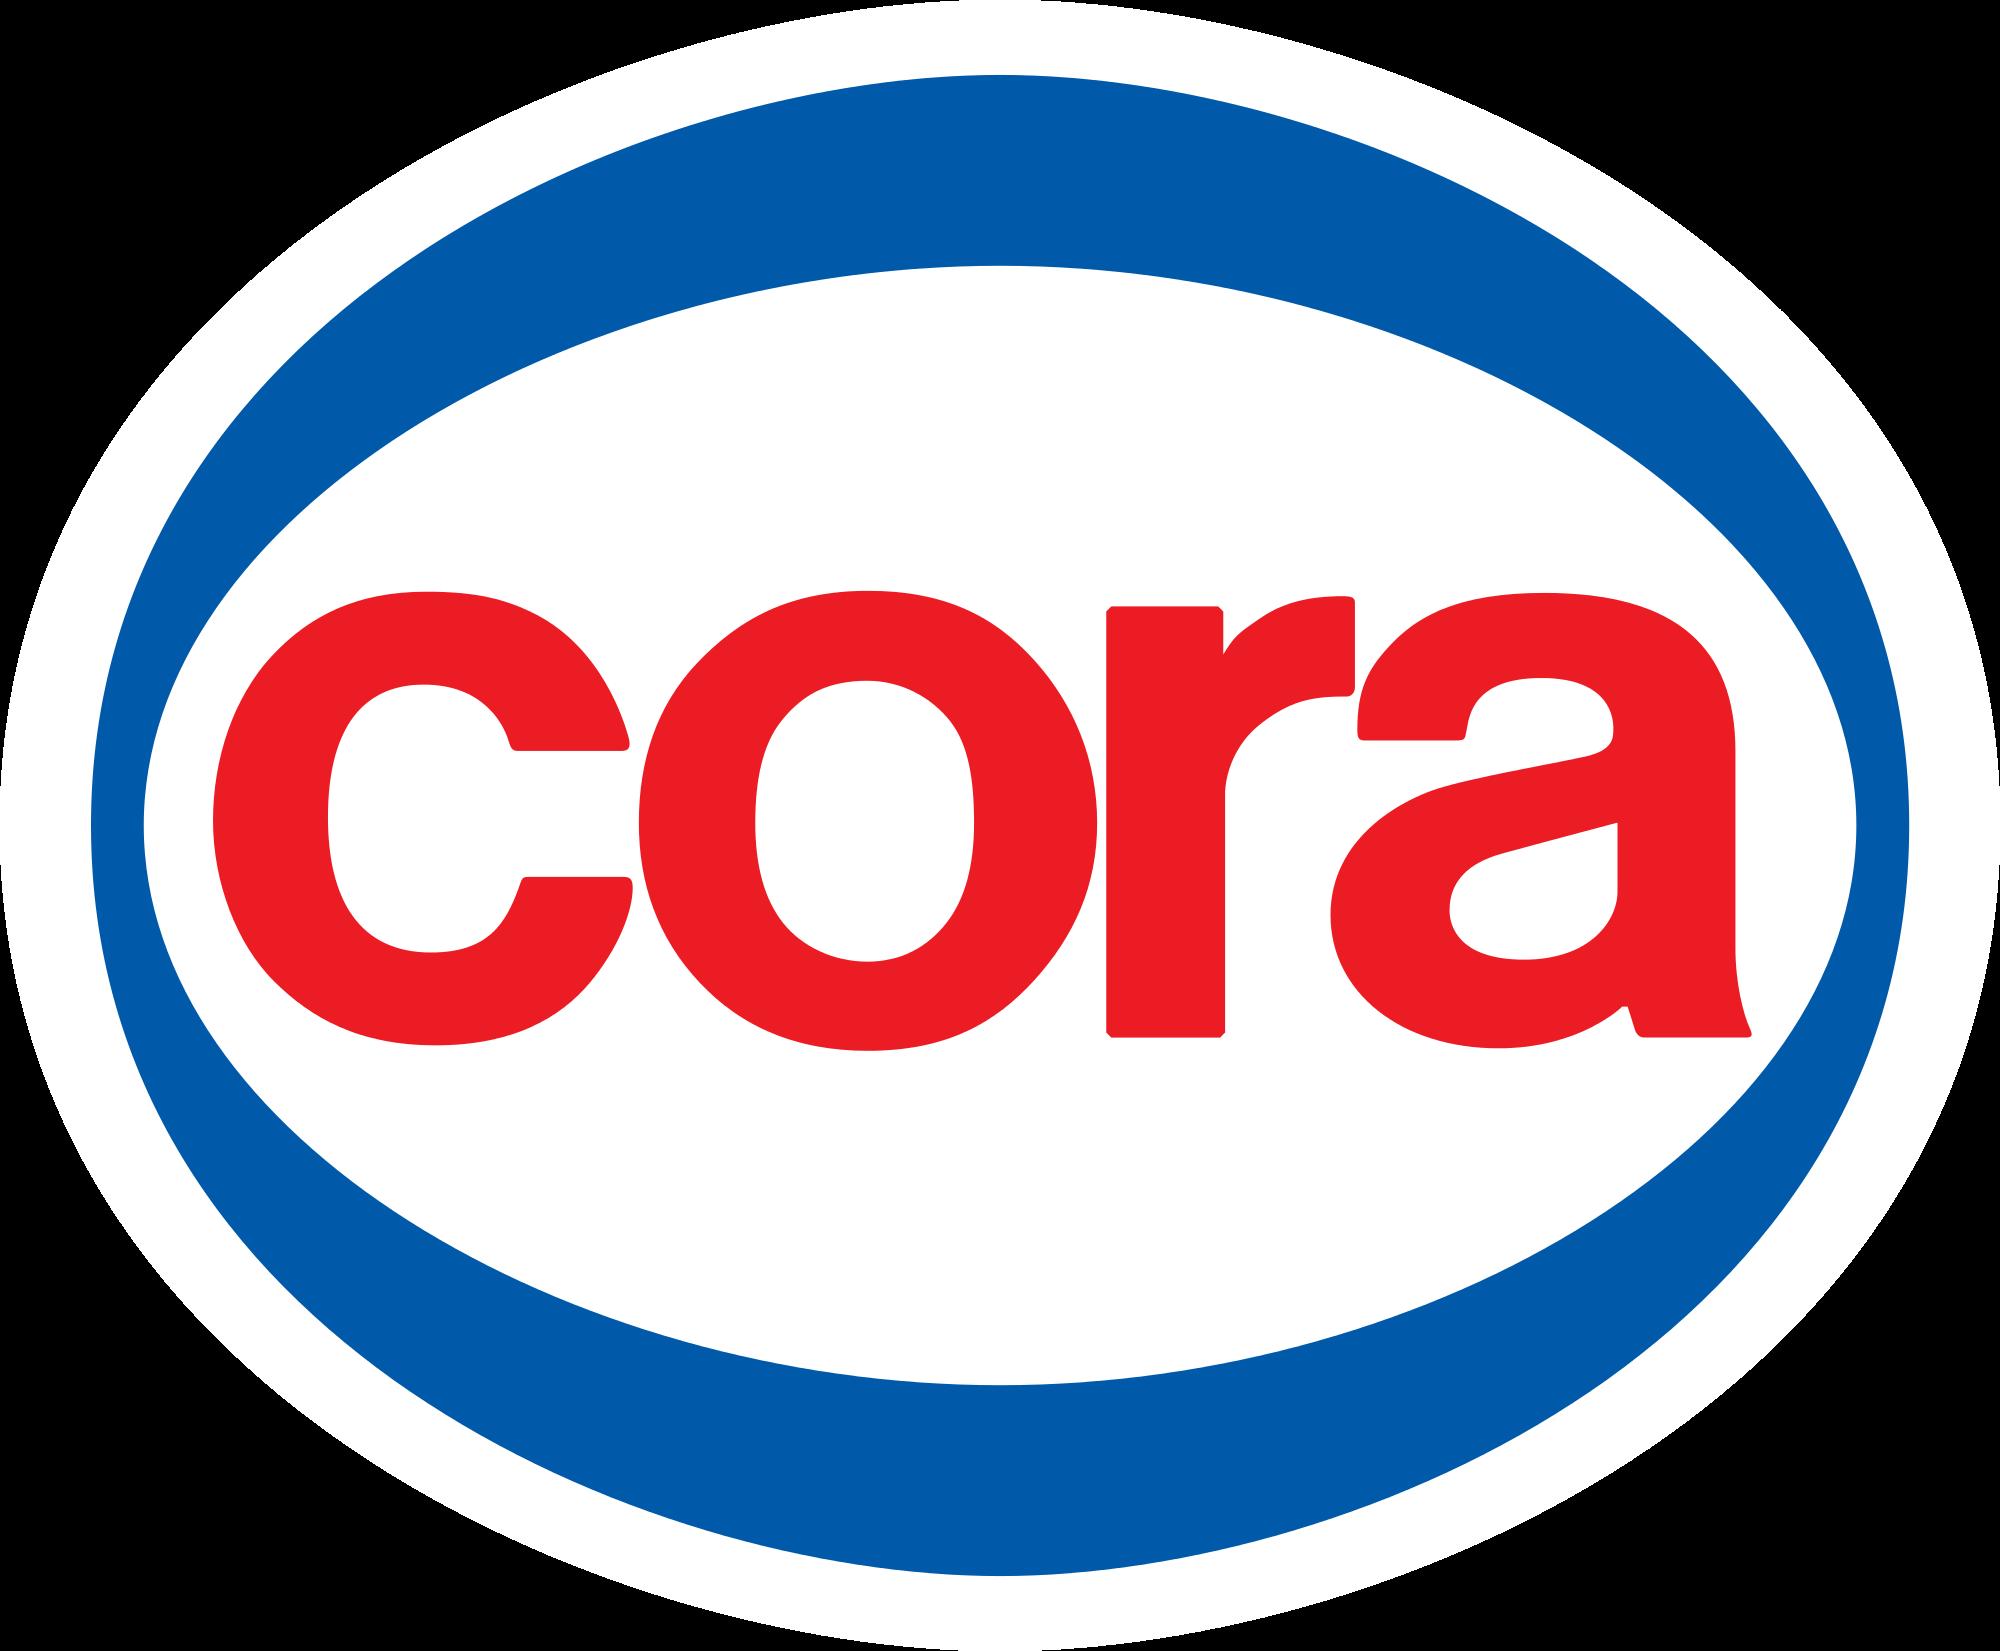 Choix du magasin: Hypermarchés Cora - www.cora.fr